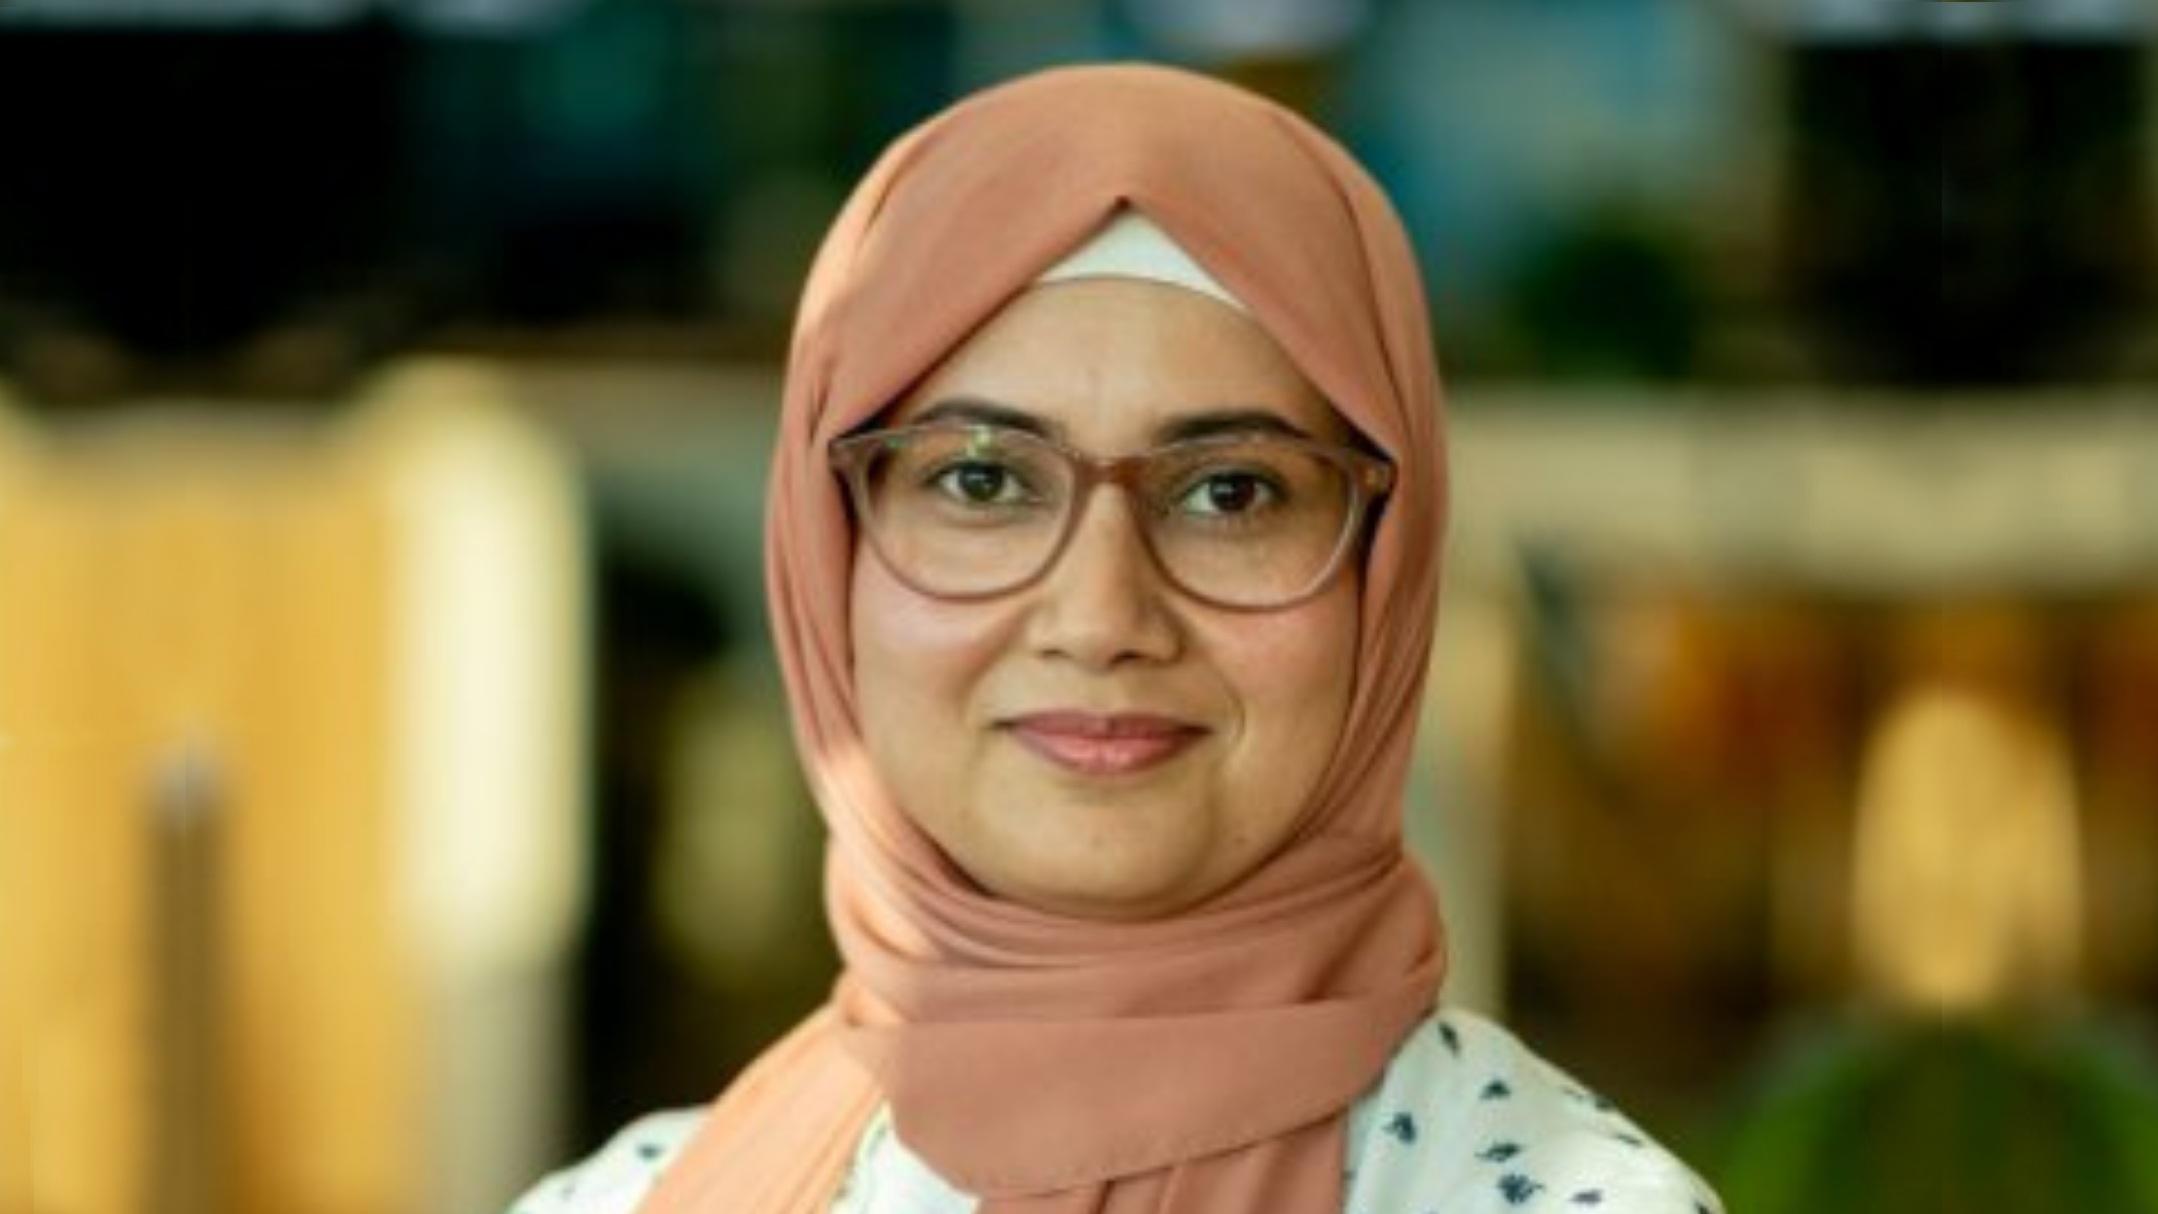 Portrait of Monash University professor Rashida Hoda in front of a blurred background.